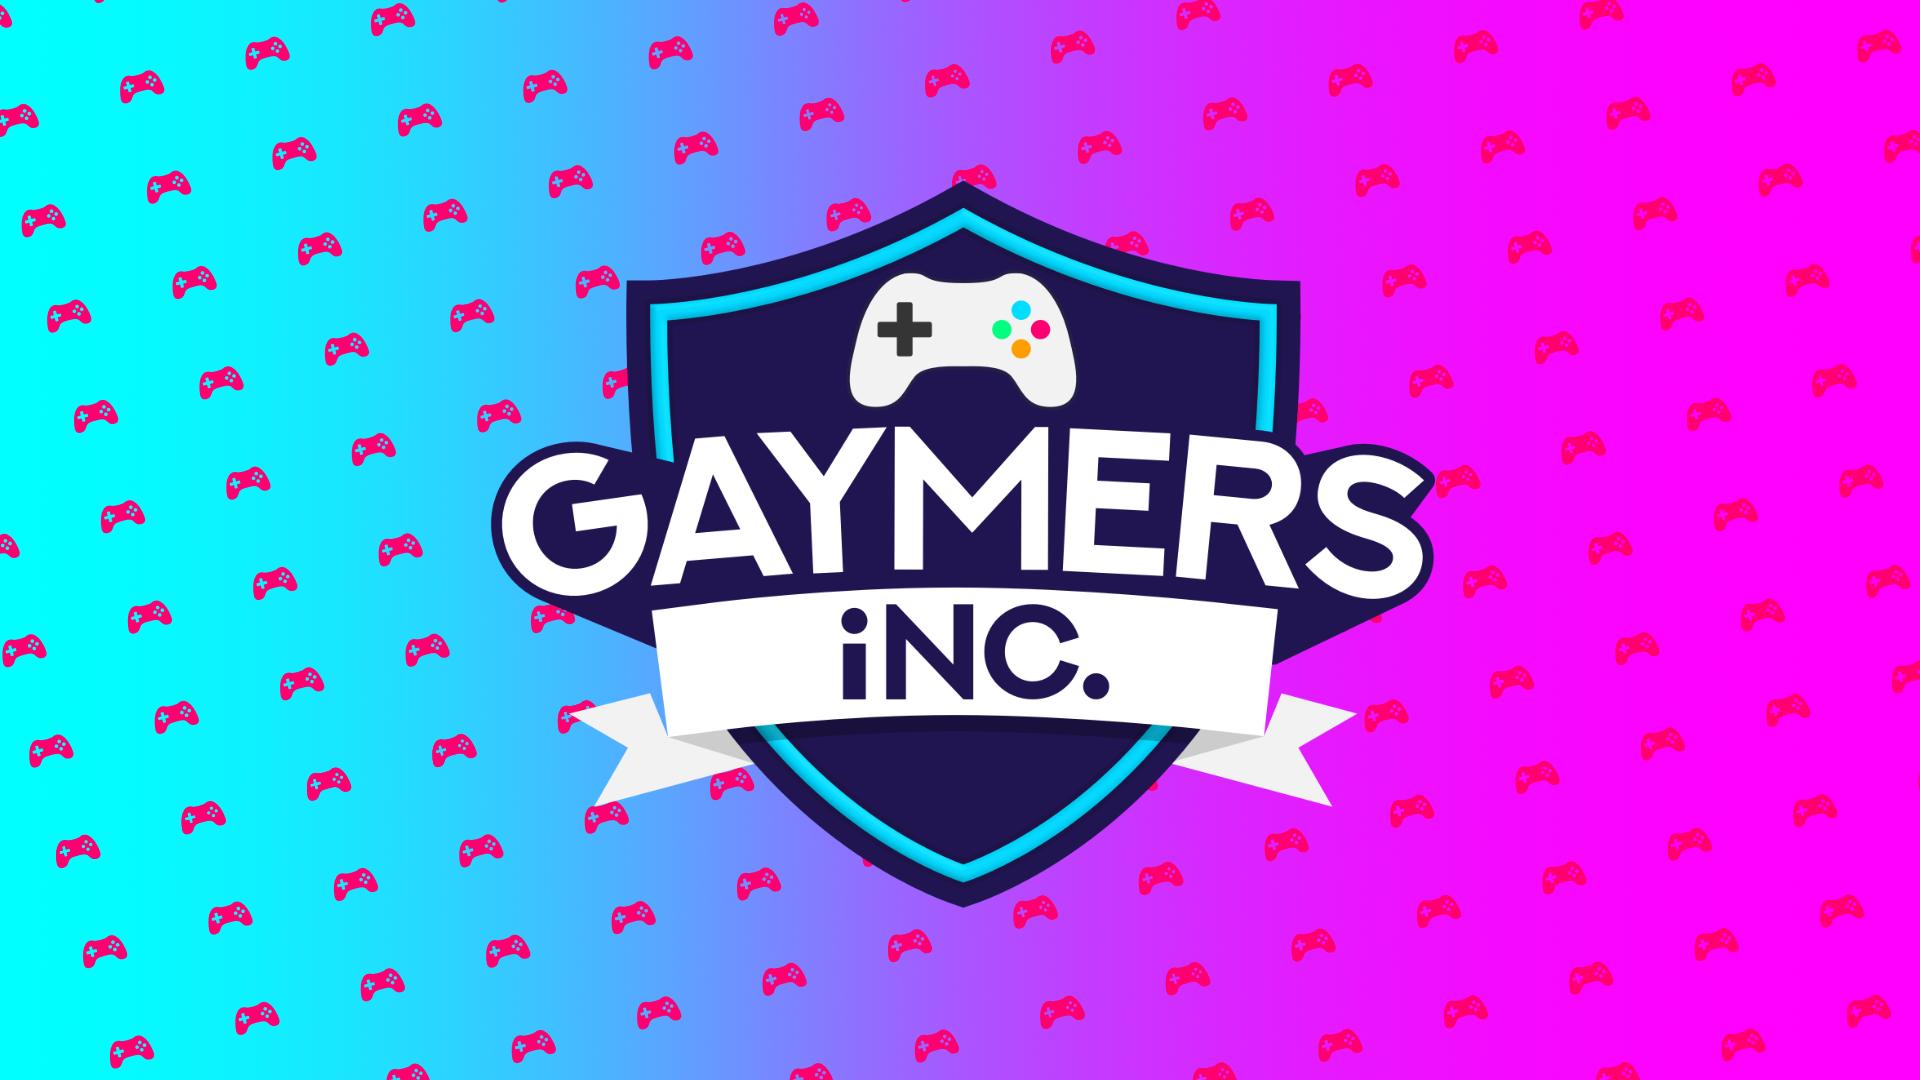 Gaymers iNC. logo